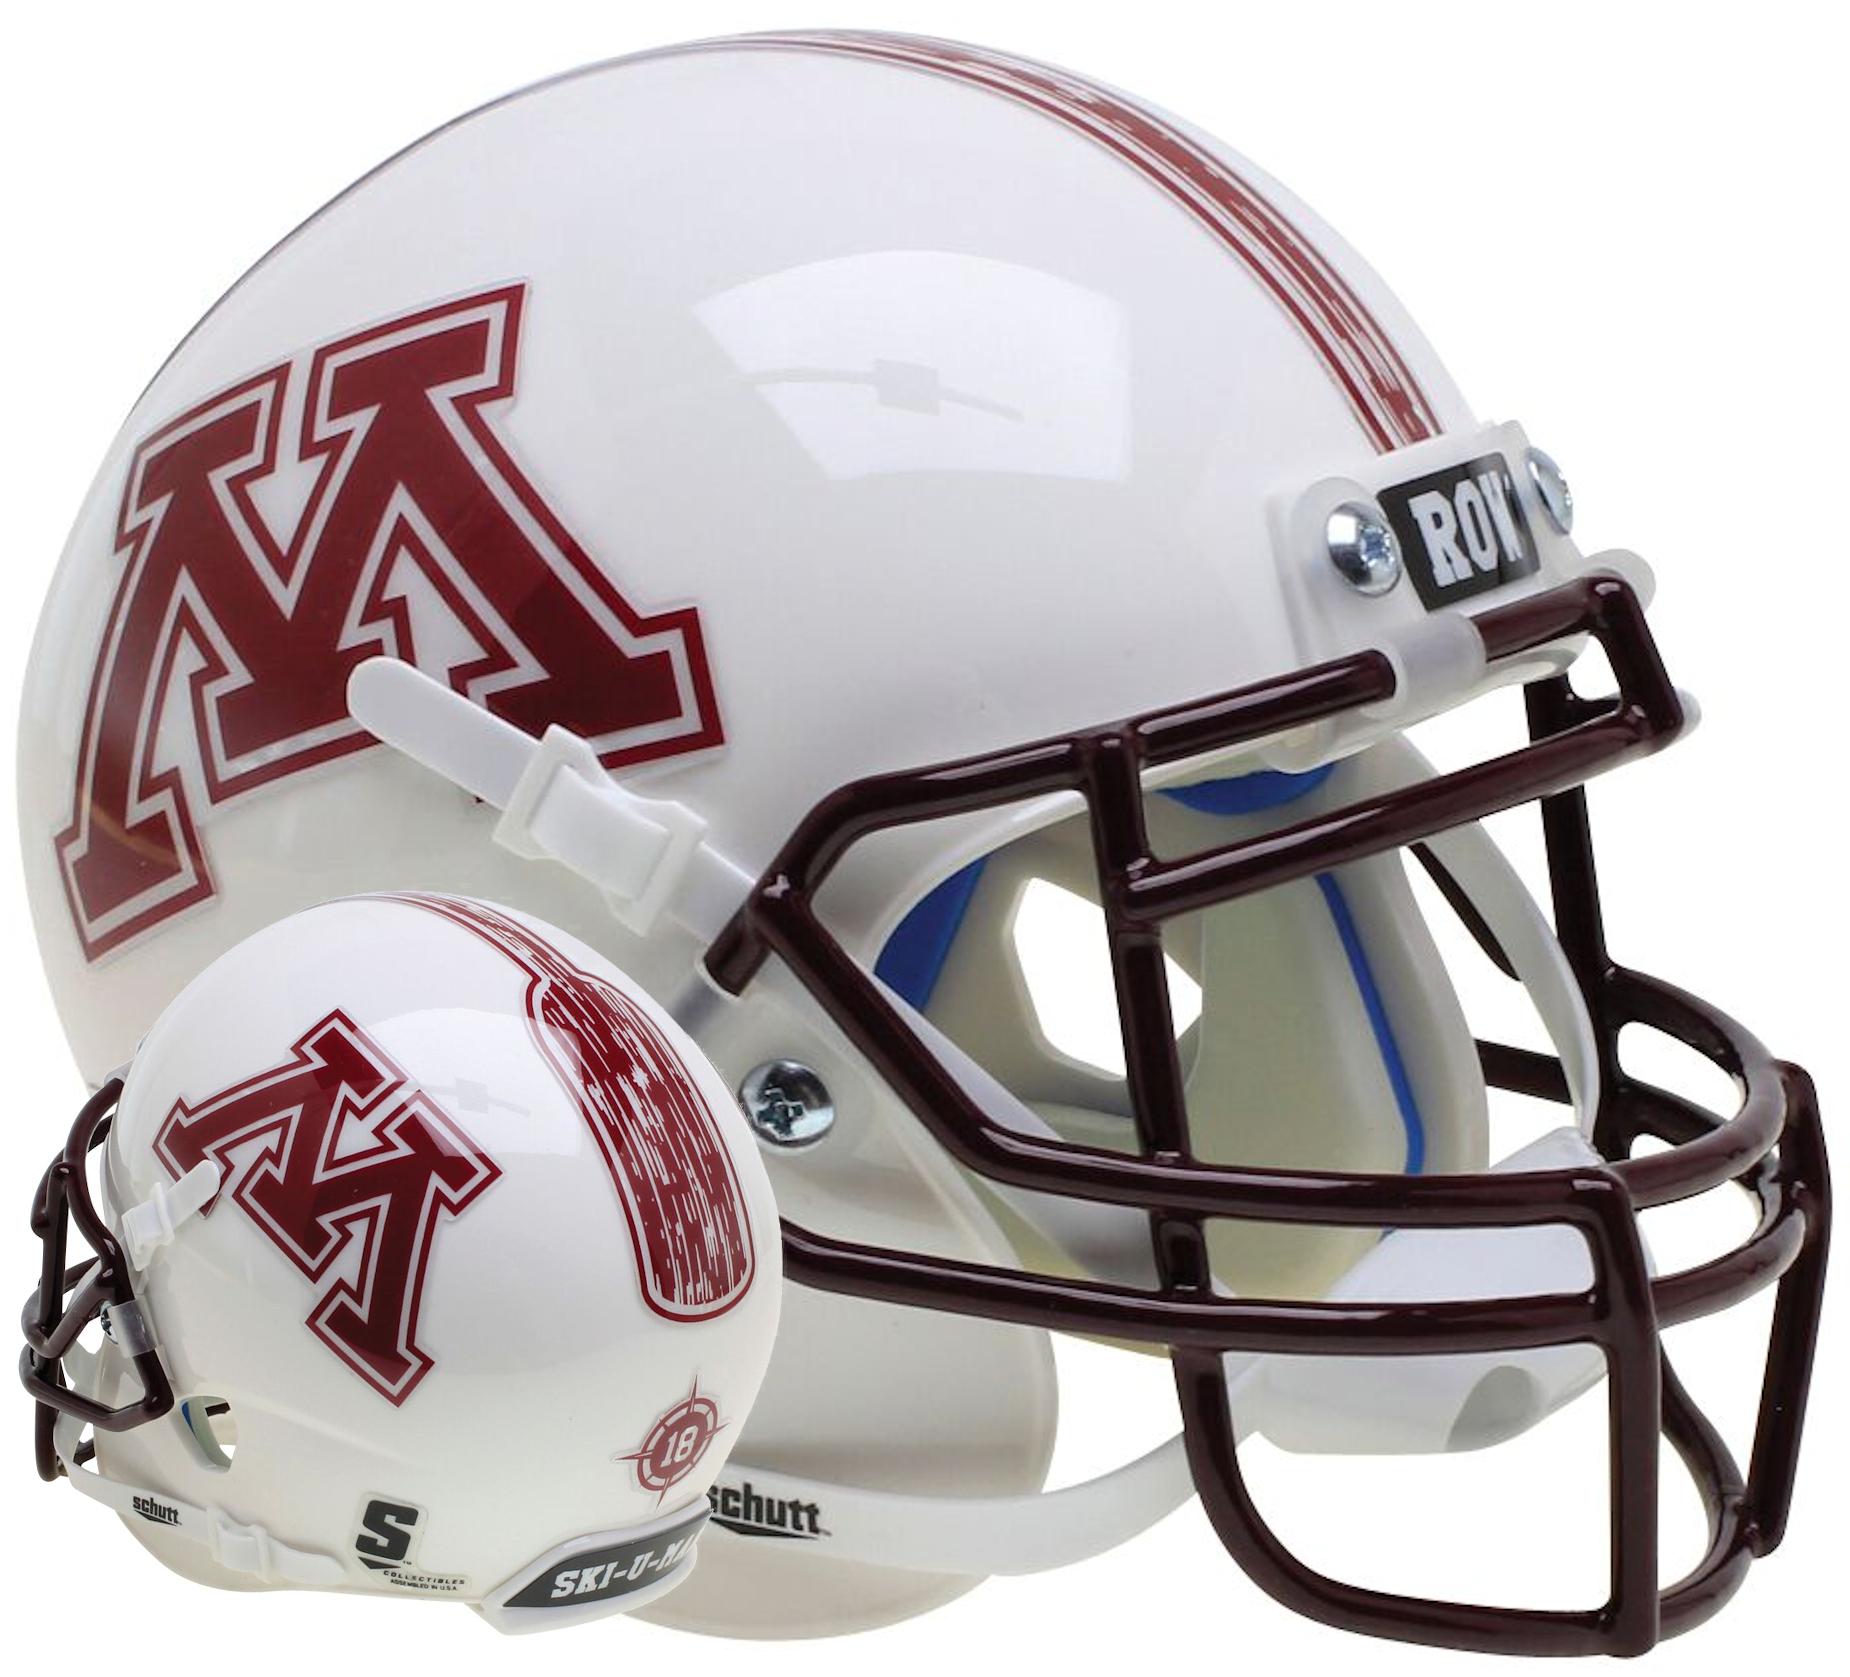 Minnesota Golden Gophers Authentic College XP Football Helmet Schutt <B>White Pinstripe</B>